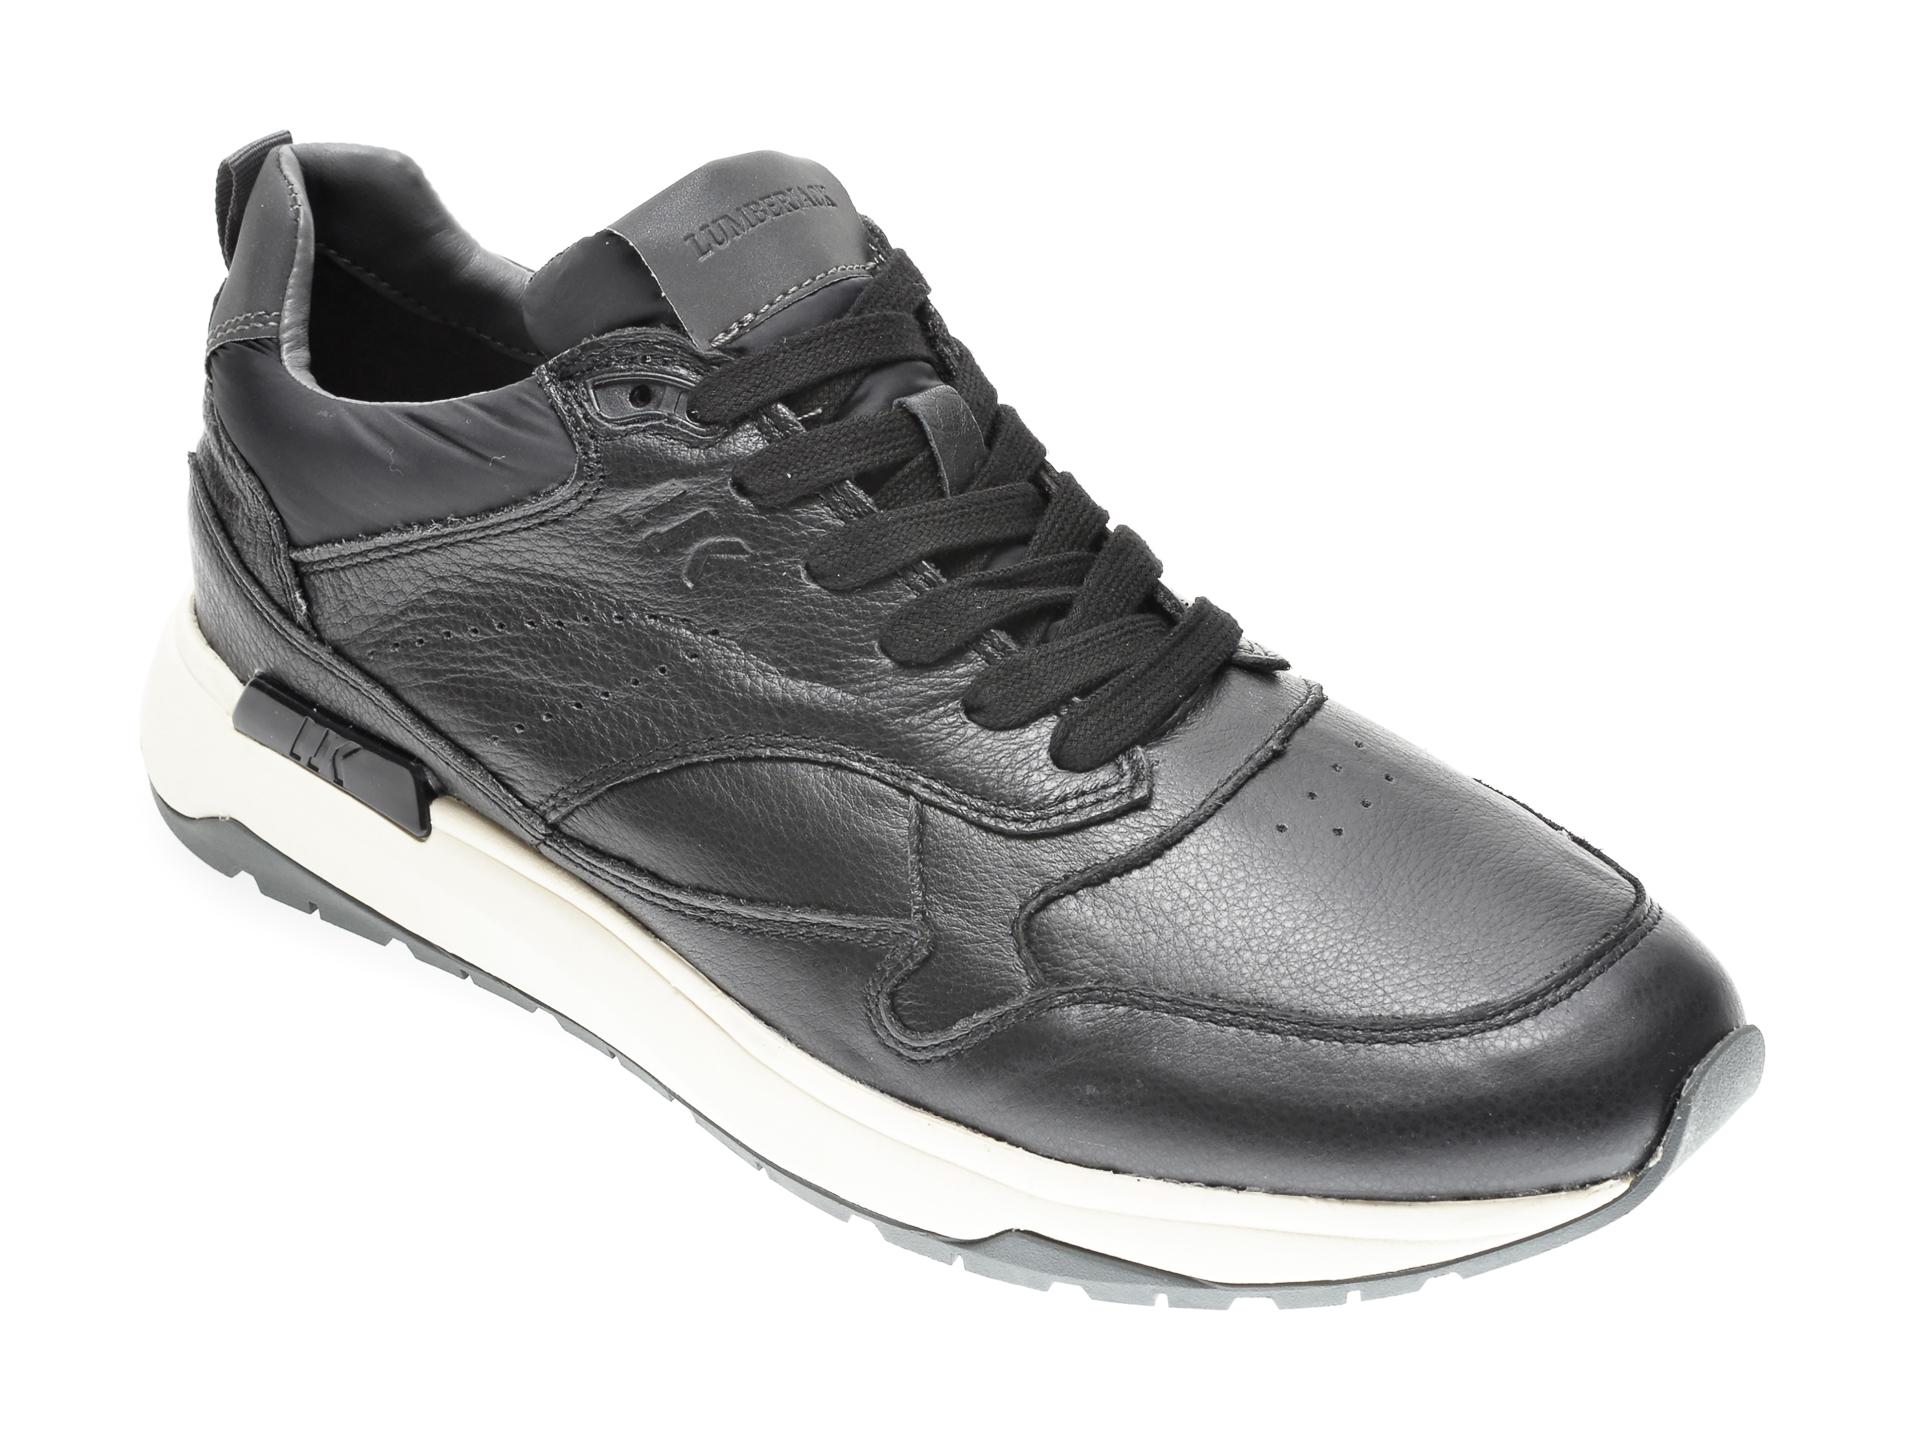 Pantofi LUMBERJACK negri, 405006, din piele naturala imagine